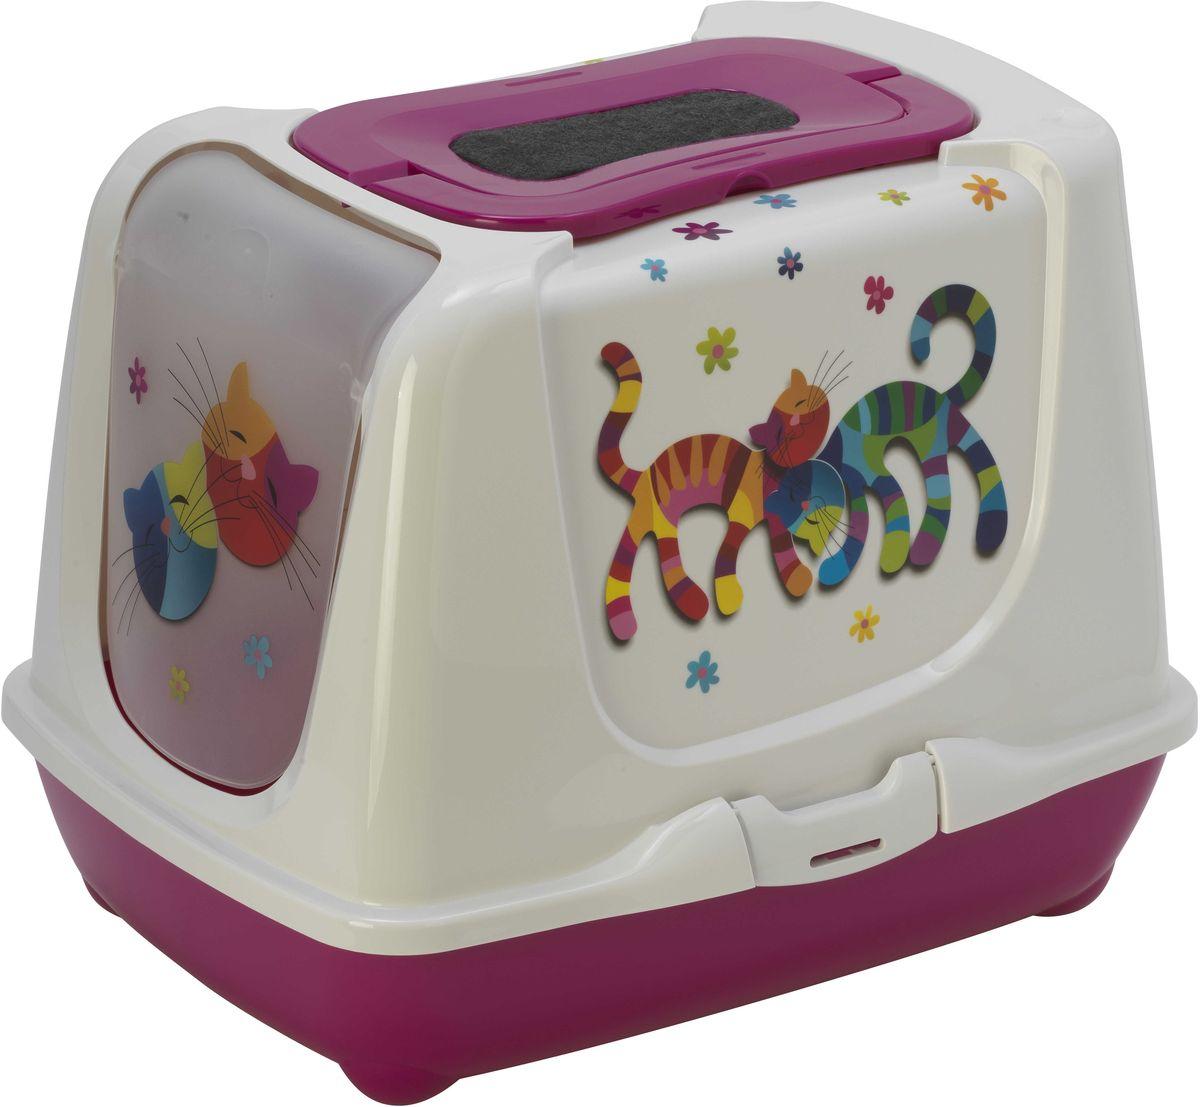 Туалет закрытый для кошек Moderna Trendy Cat. Друзья Навсегда, цвет: ярко-розовый, 50 х 39,5 х 37,5 см14C235328